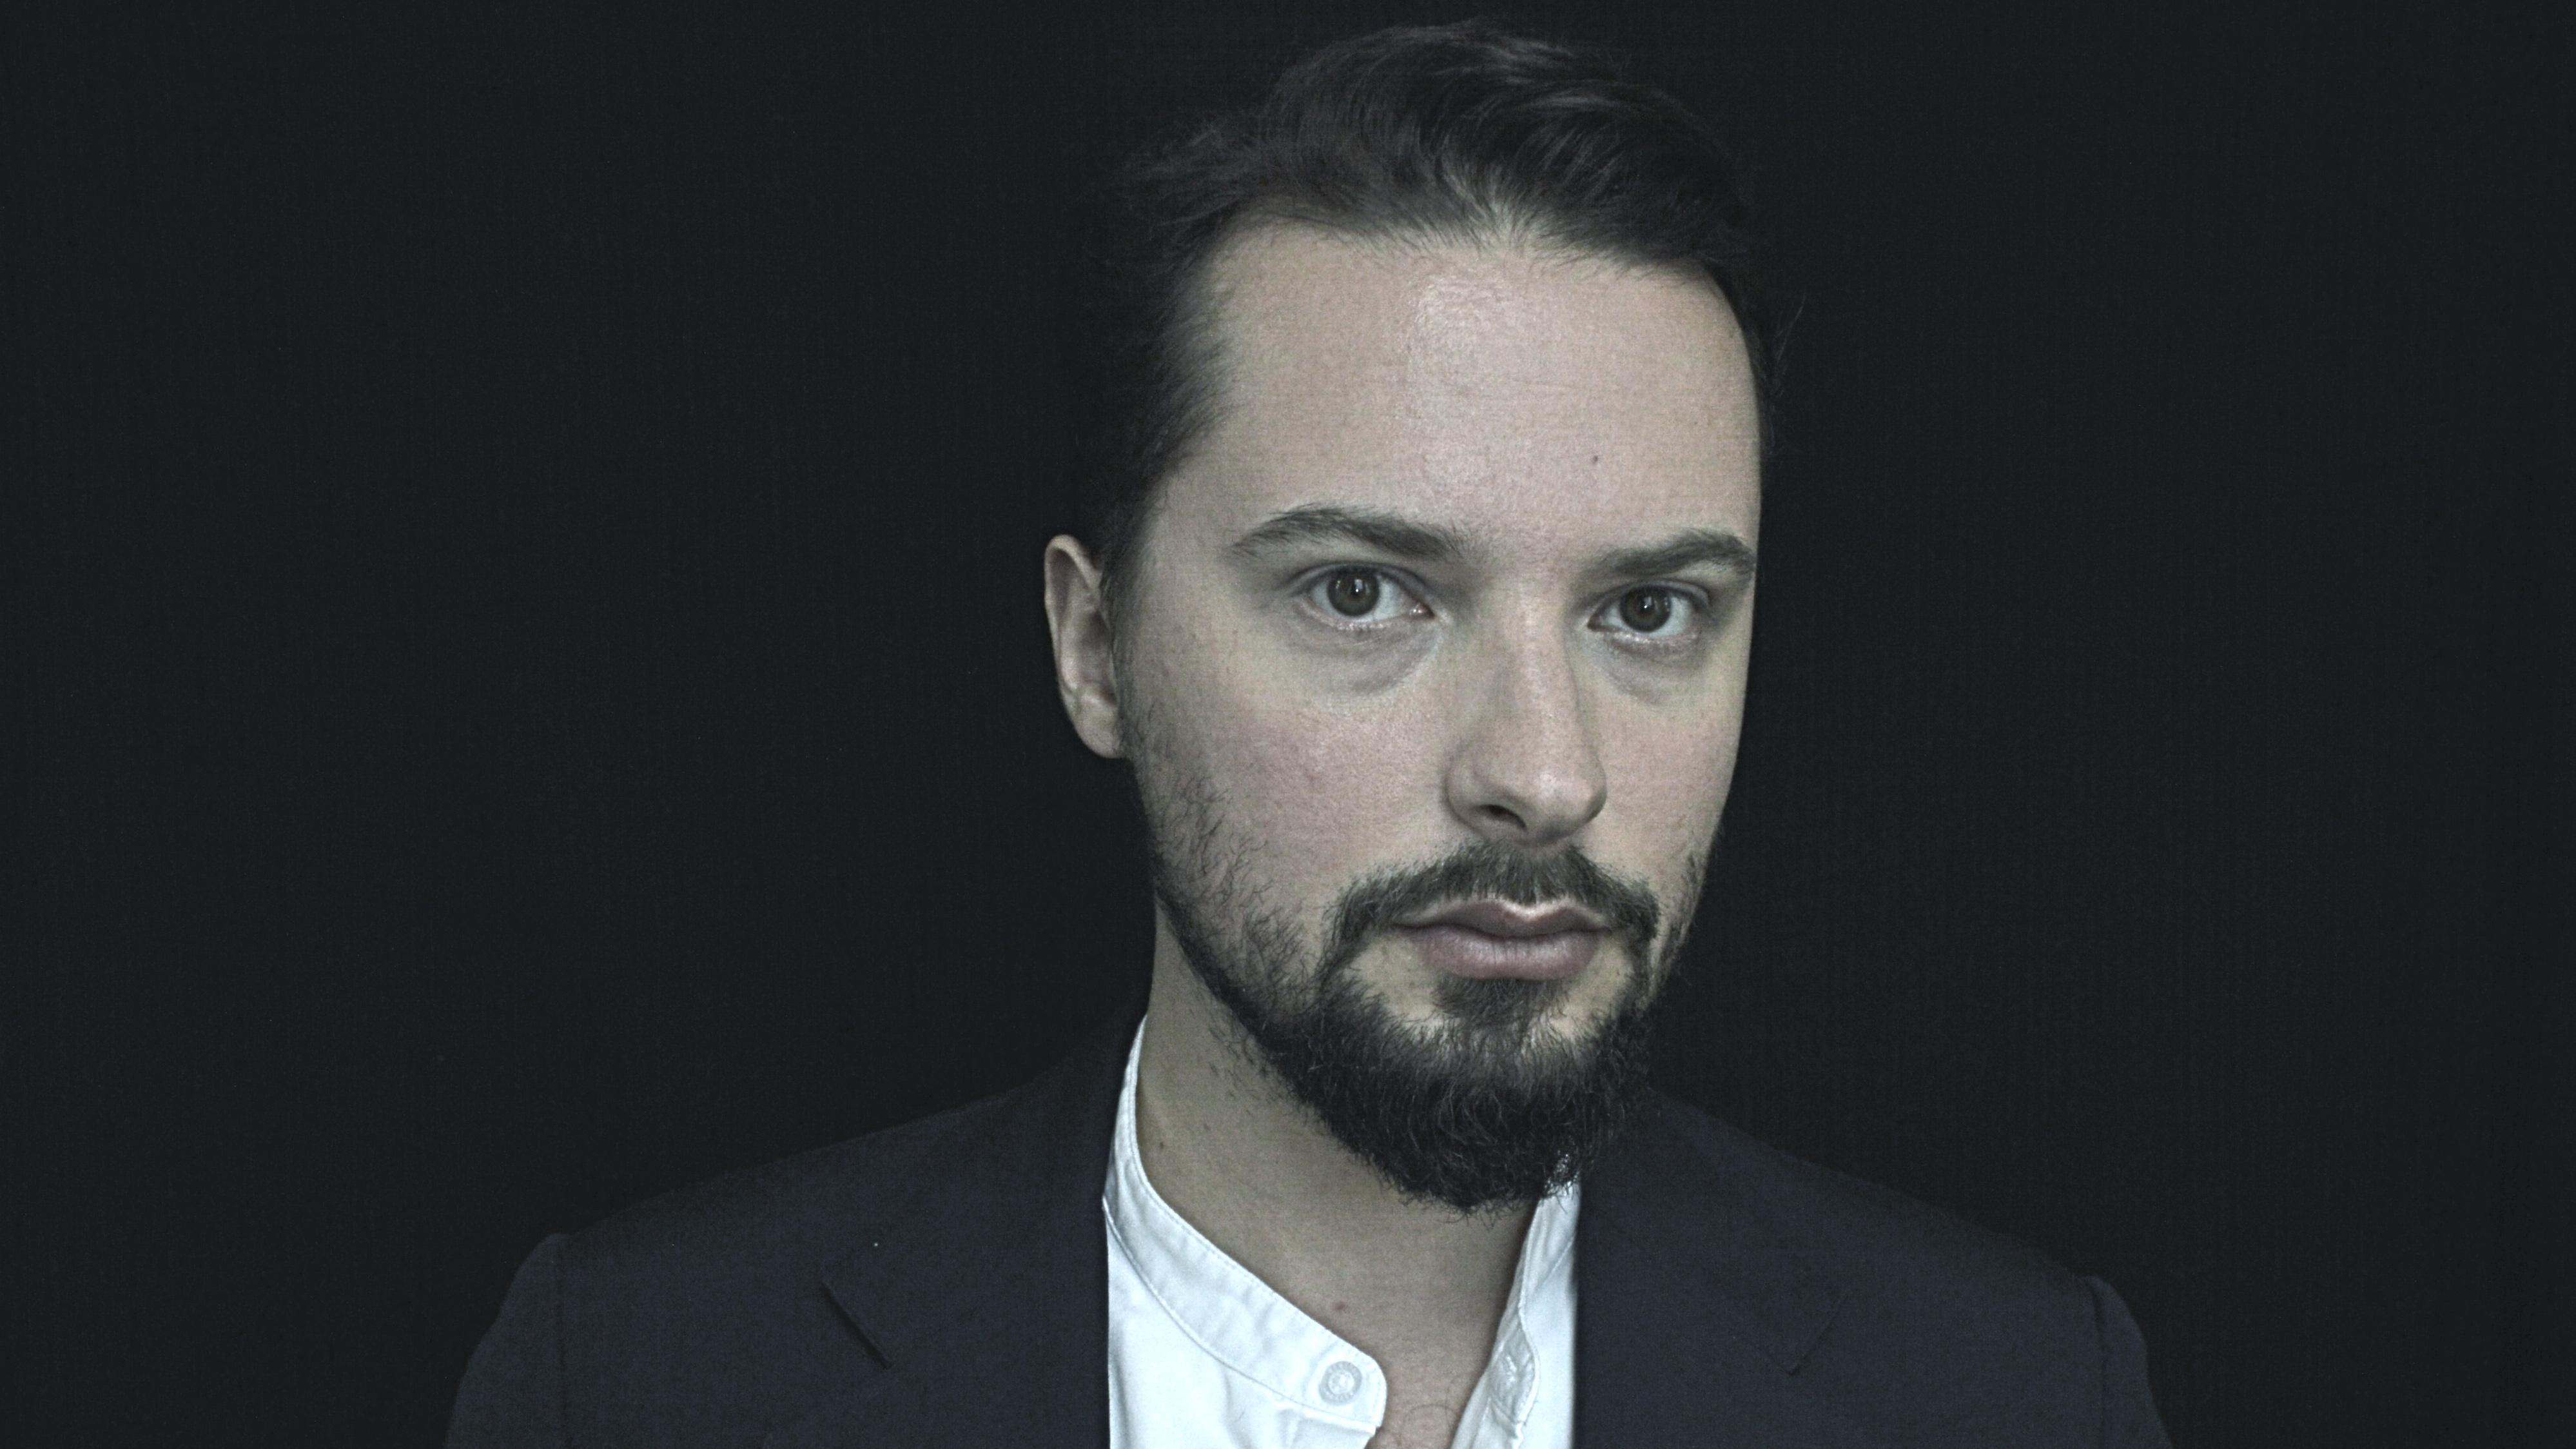 Antoni Komasa-Łazarkiewicz Honoured with 'Individual Achievement in Music' Award